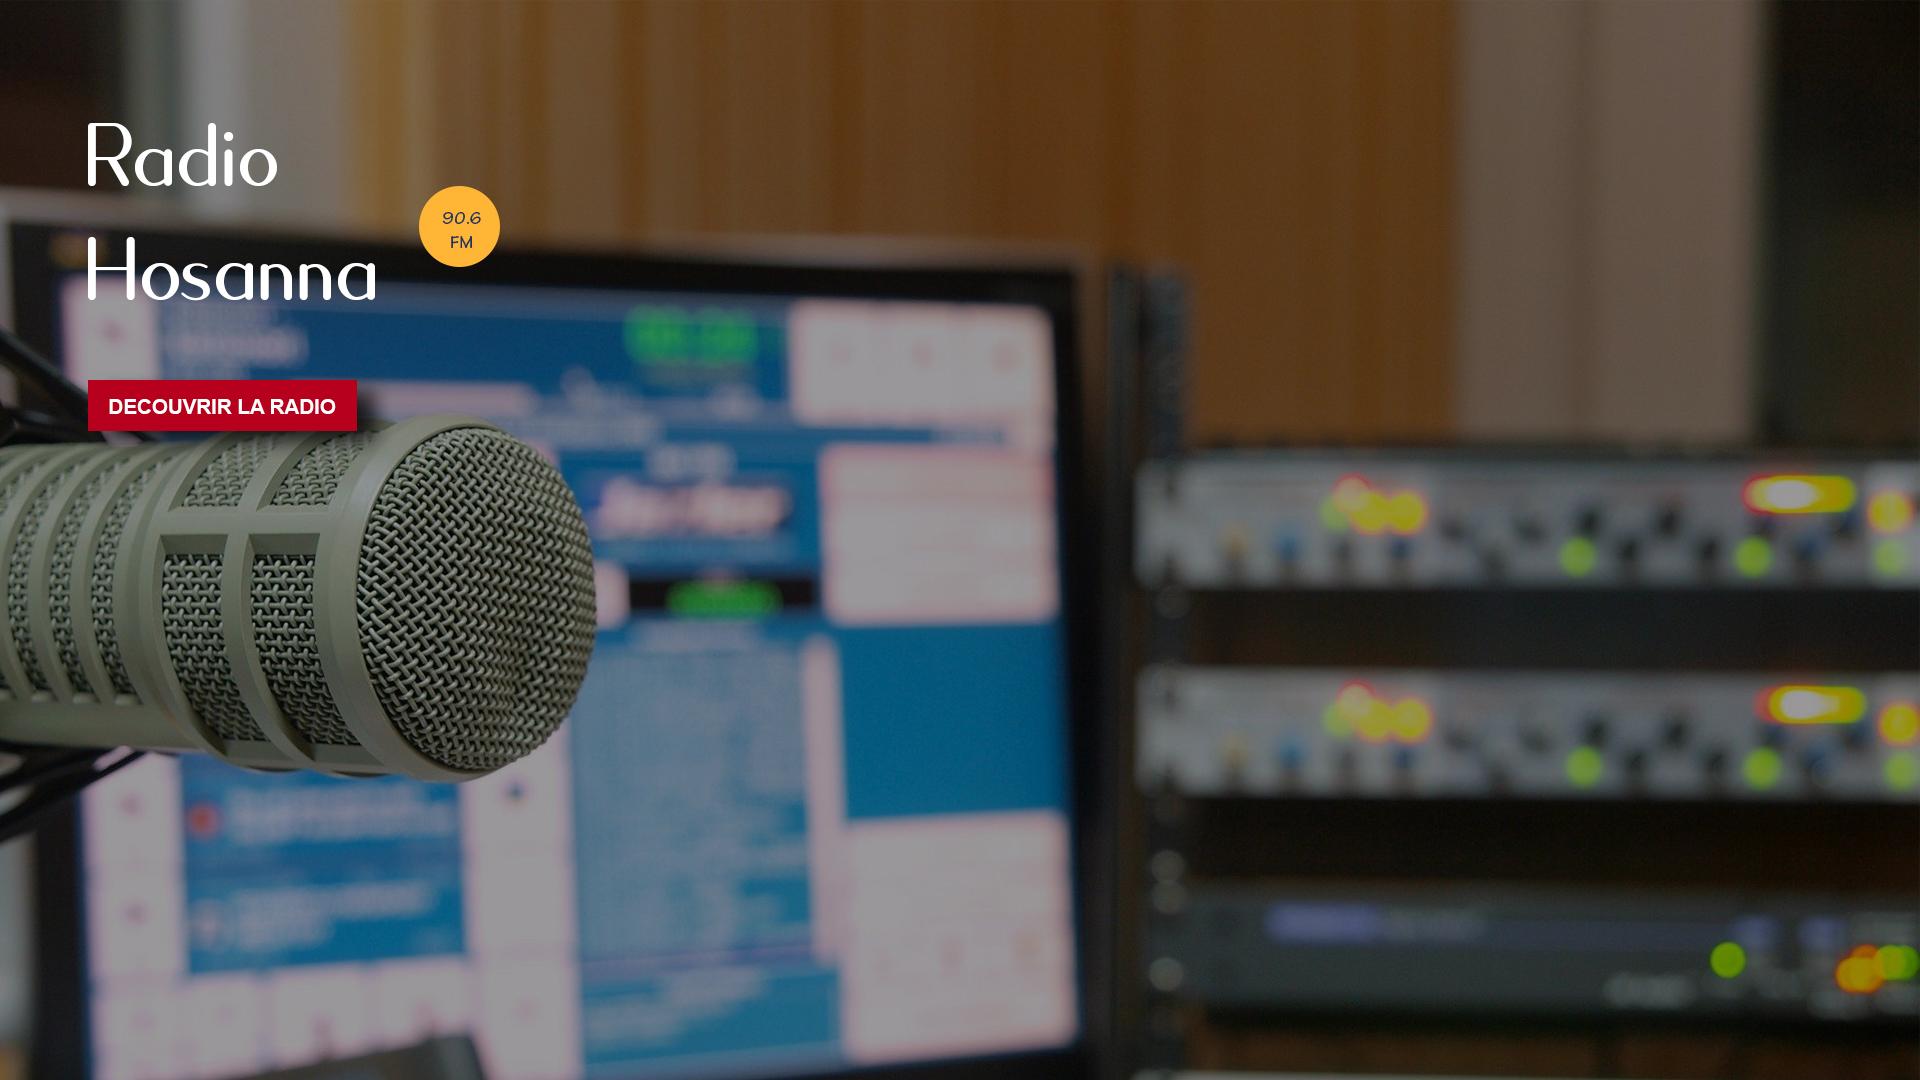 Bienvenue sur le portail de Radio Hosanna